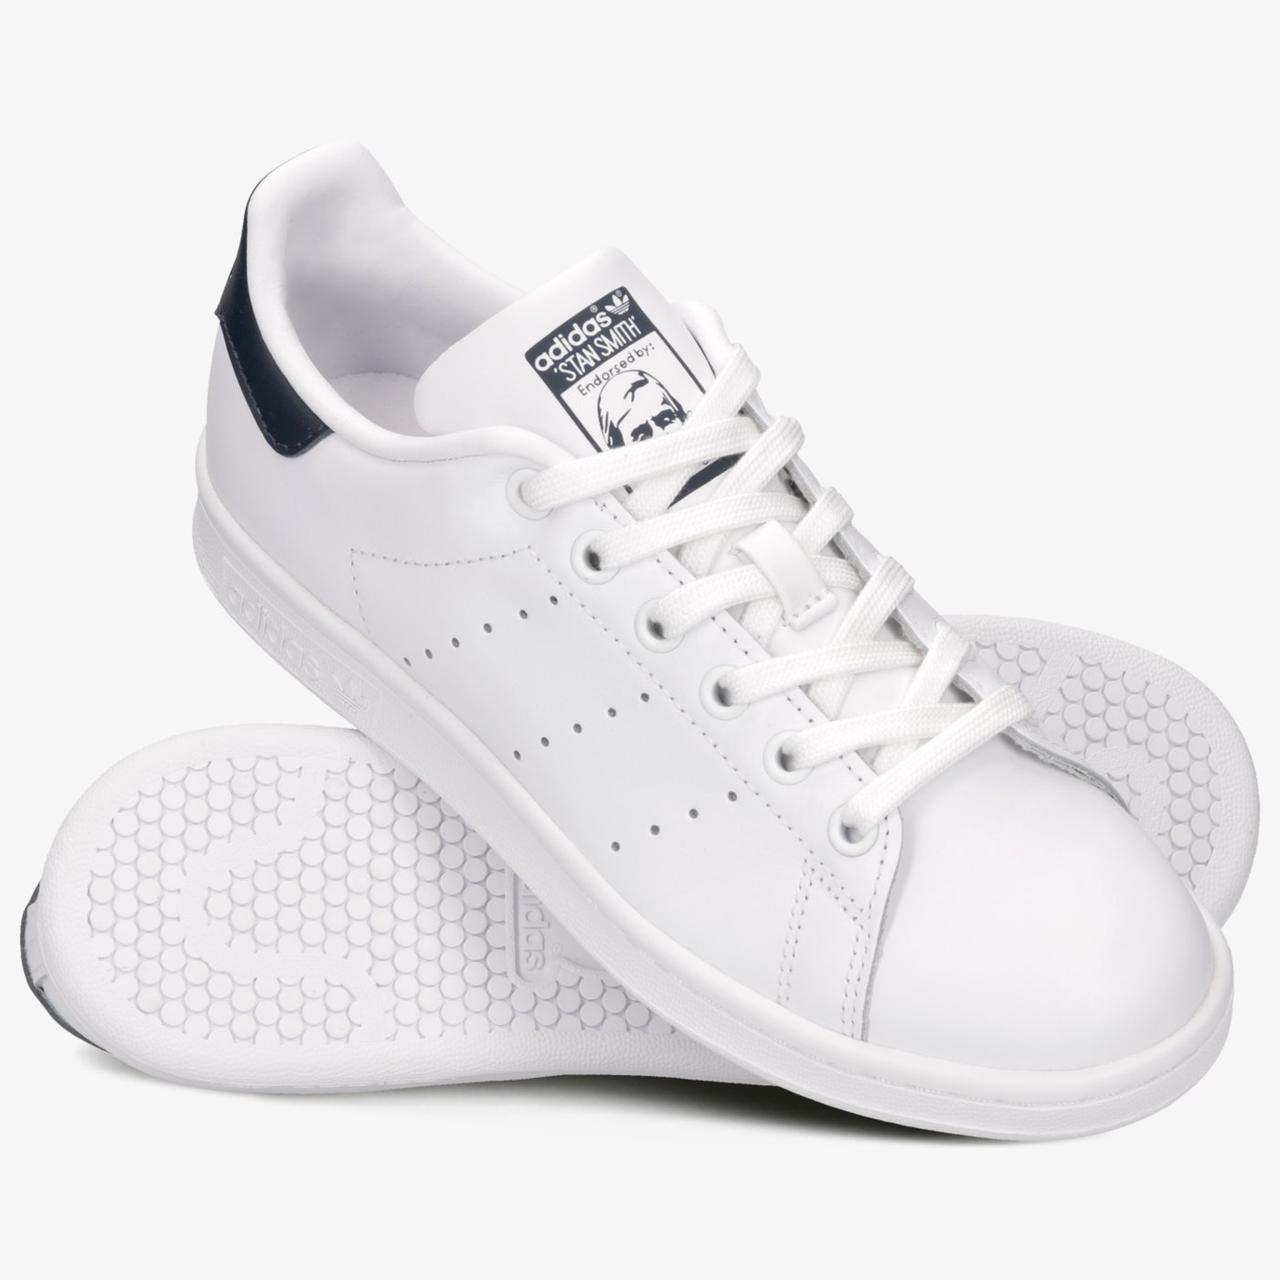 Женские кроссовки Adidas Stan Smith белые White Black